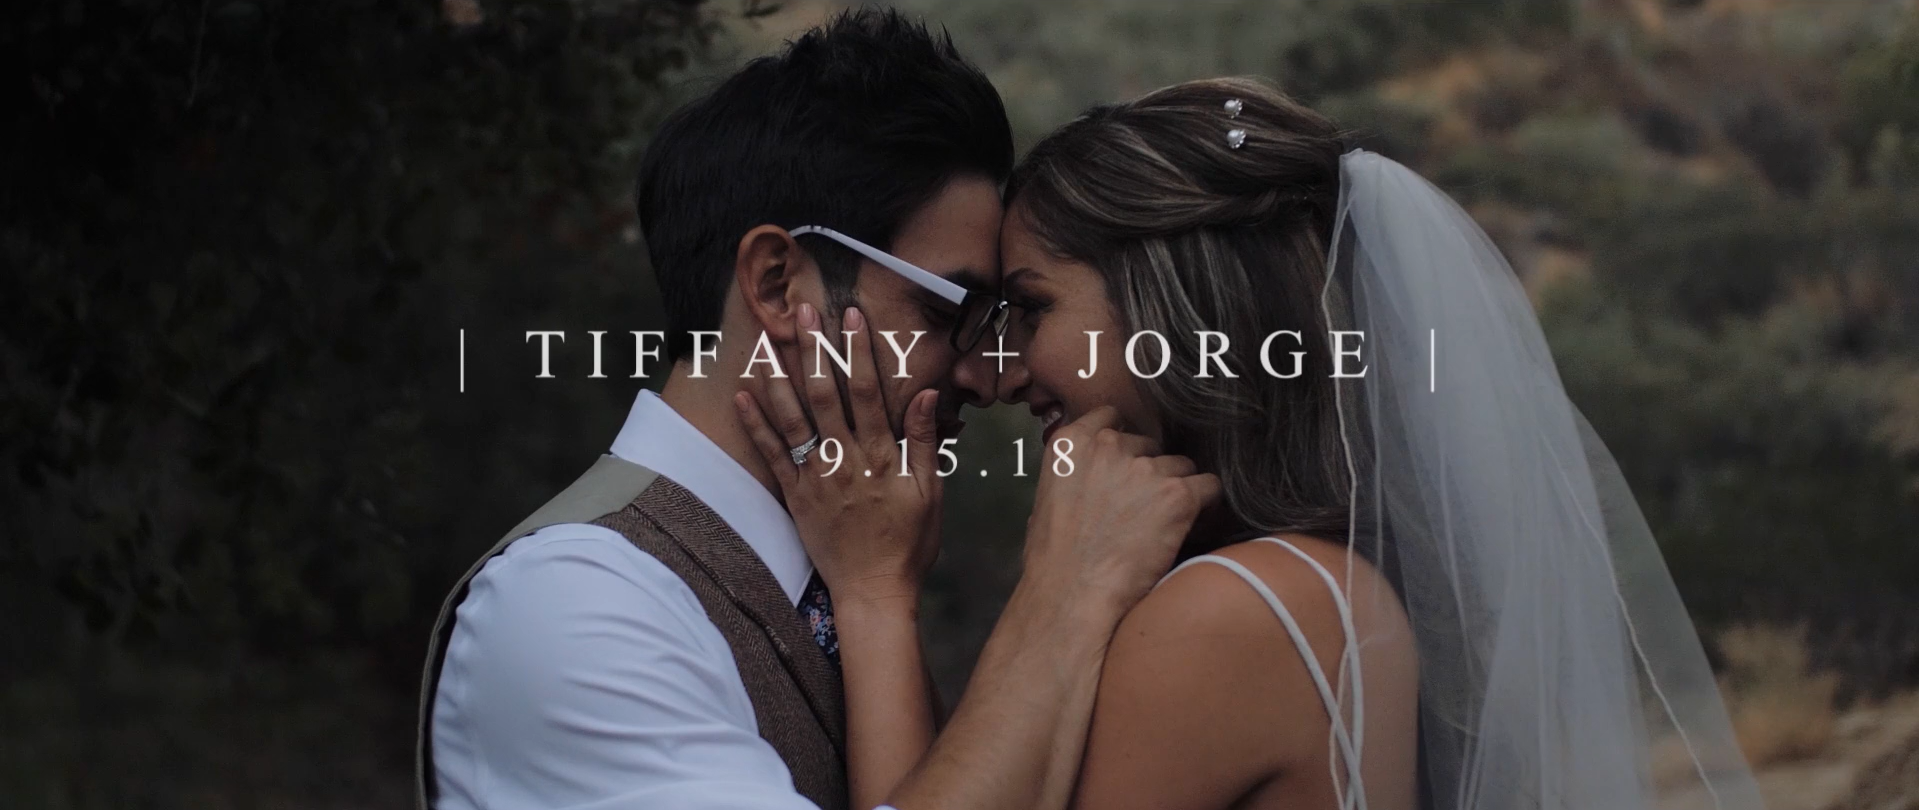 Tiffany + Jorge | El Monte, California | House